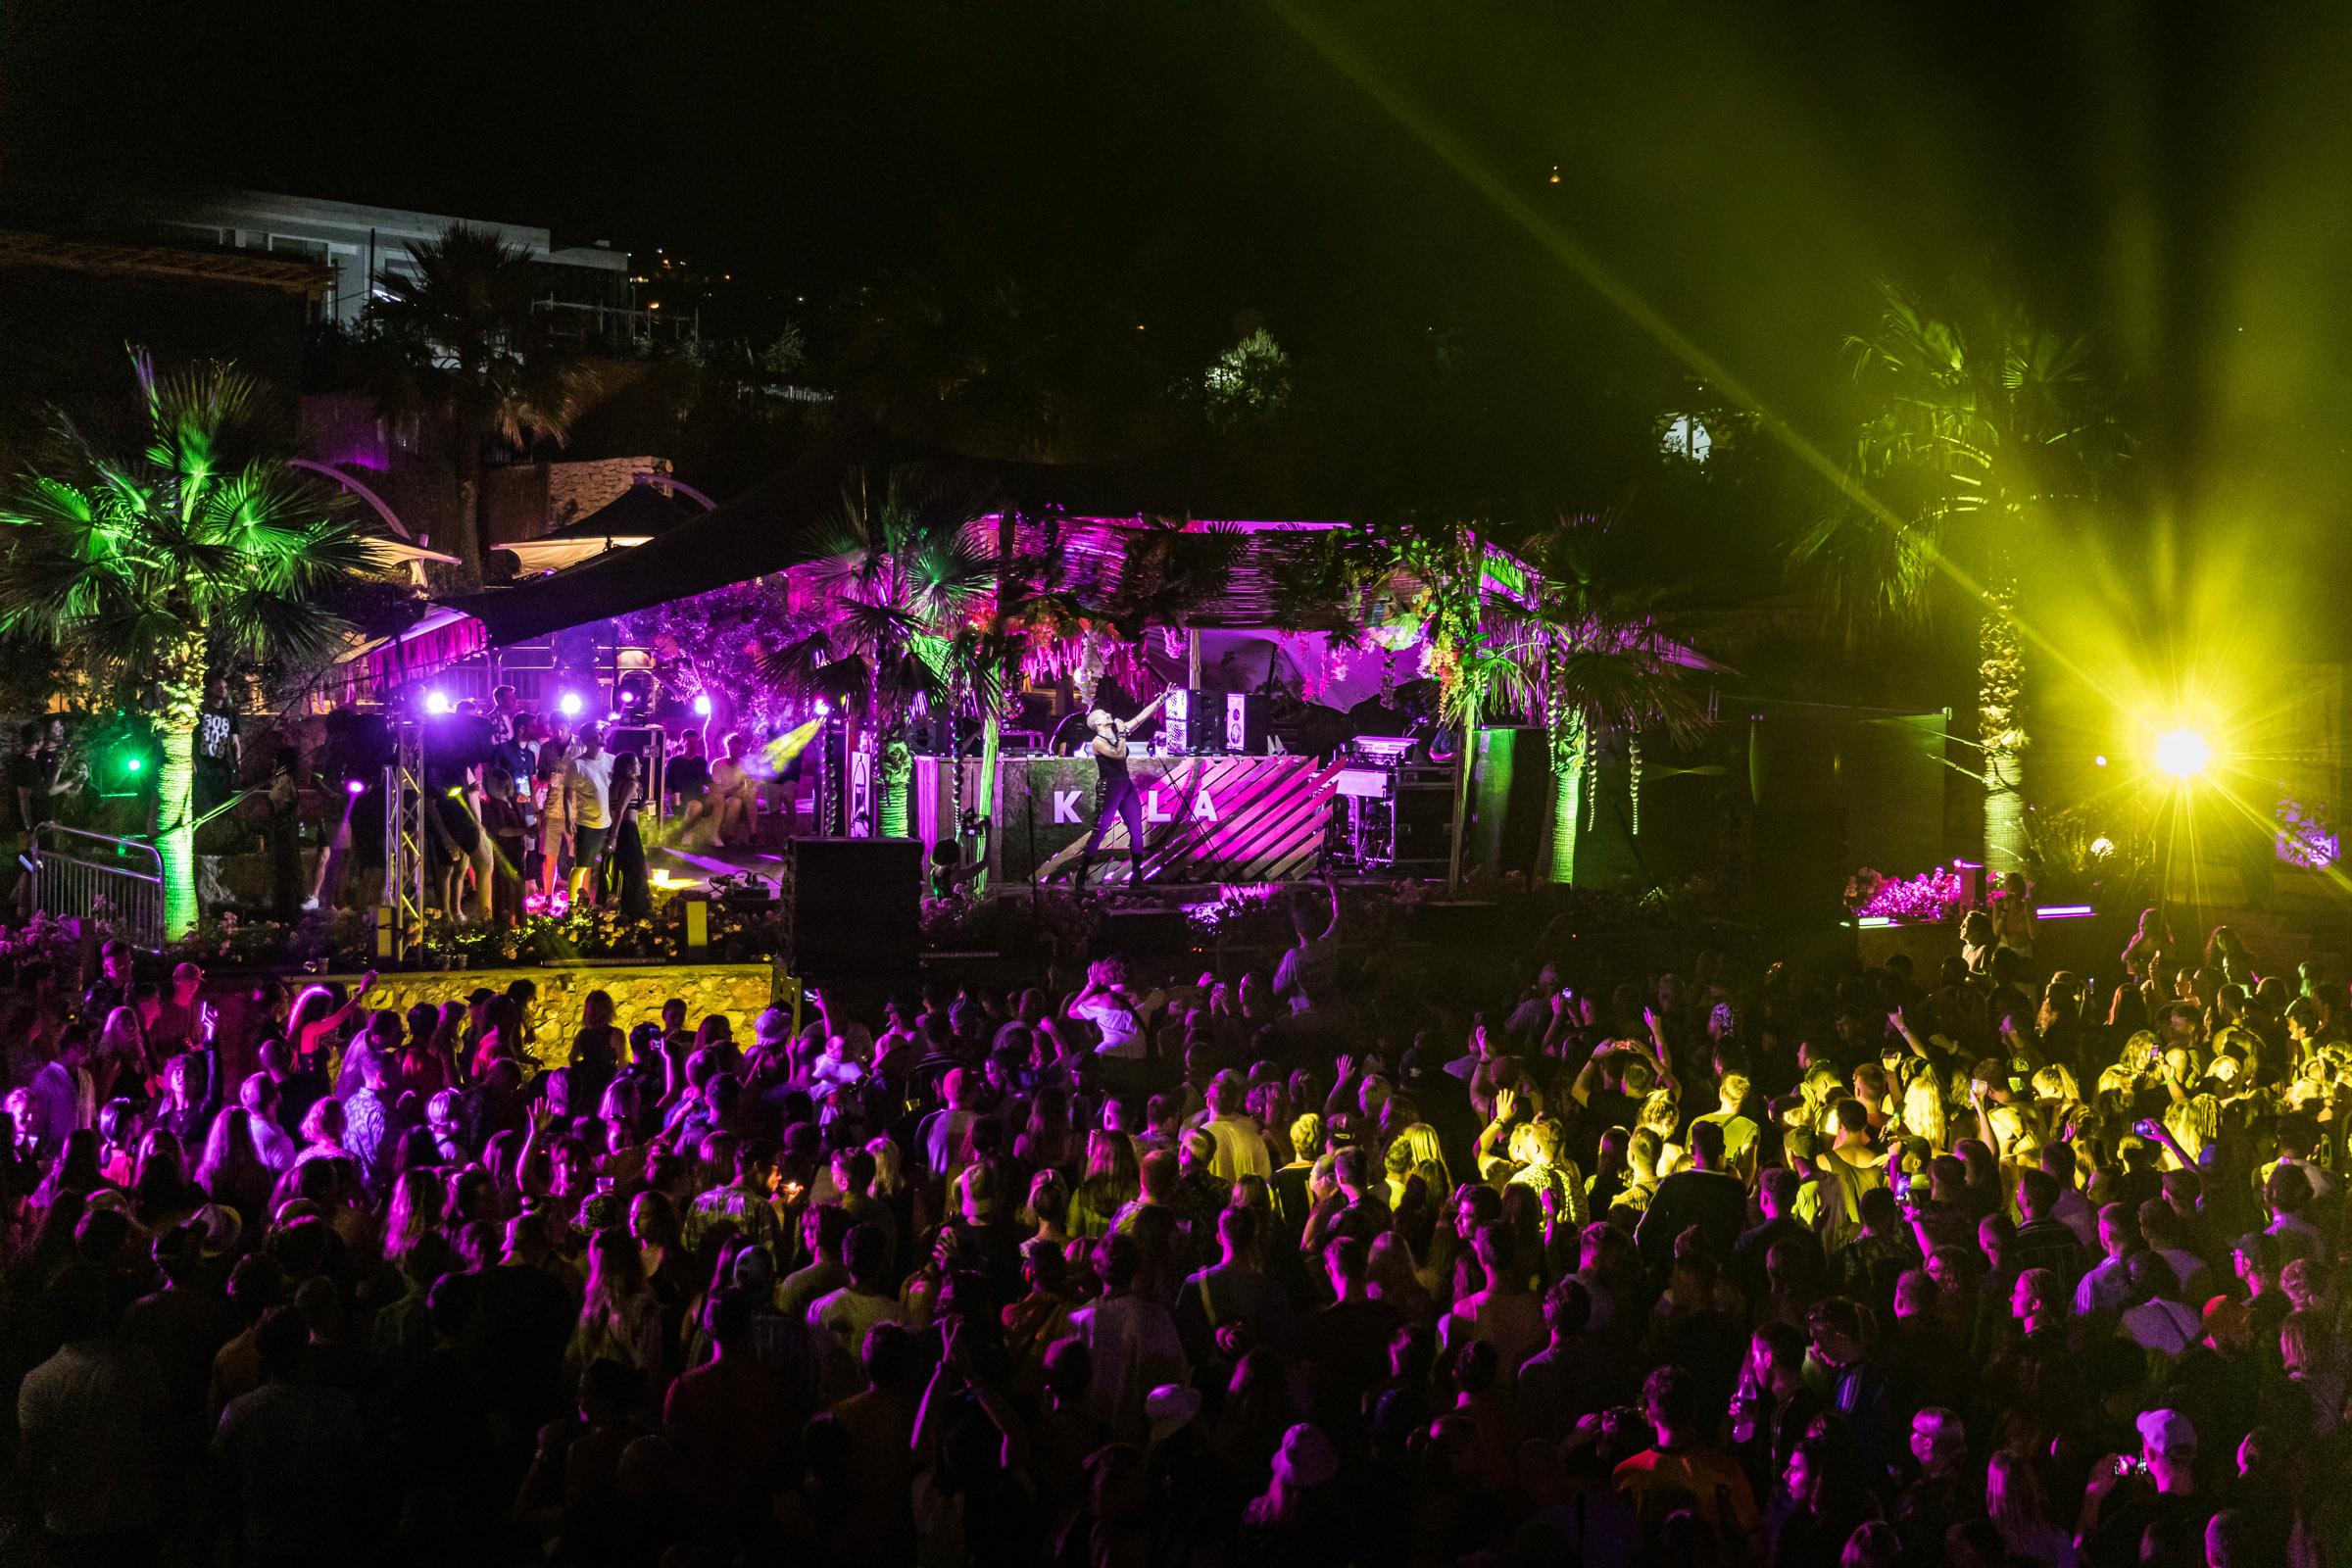 Kala Festival - Albania